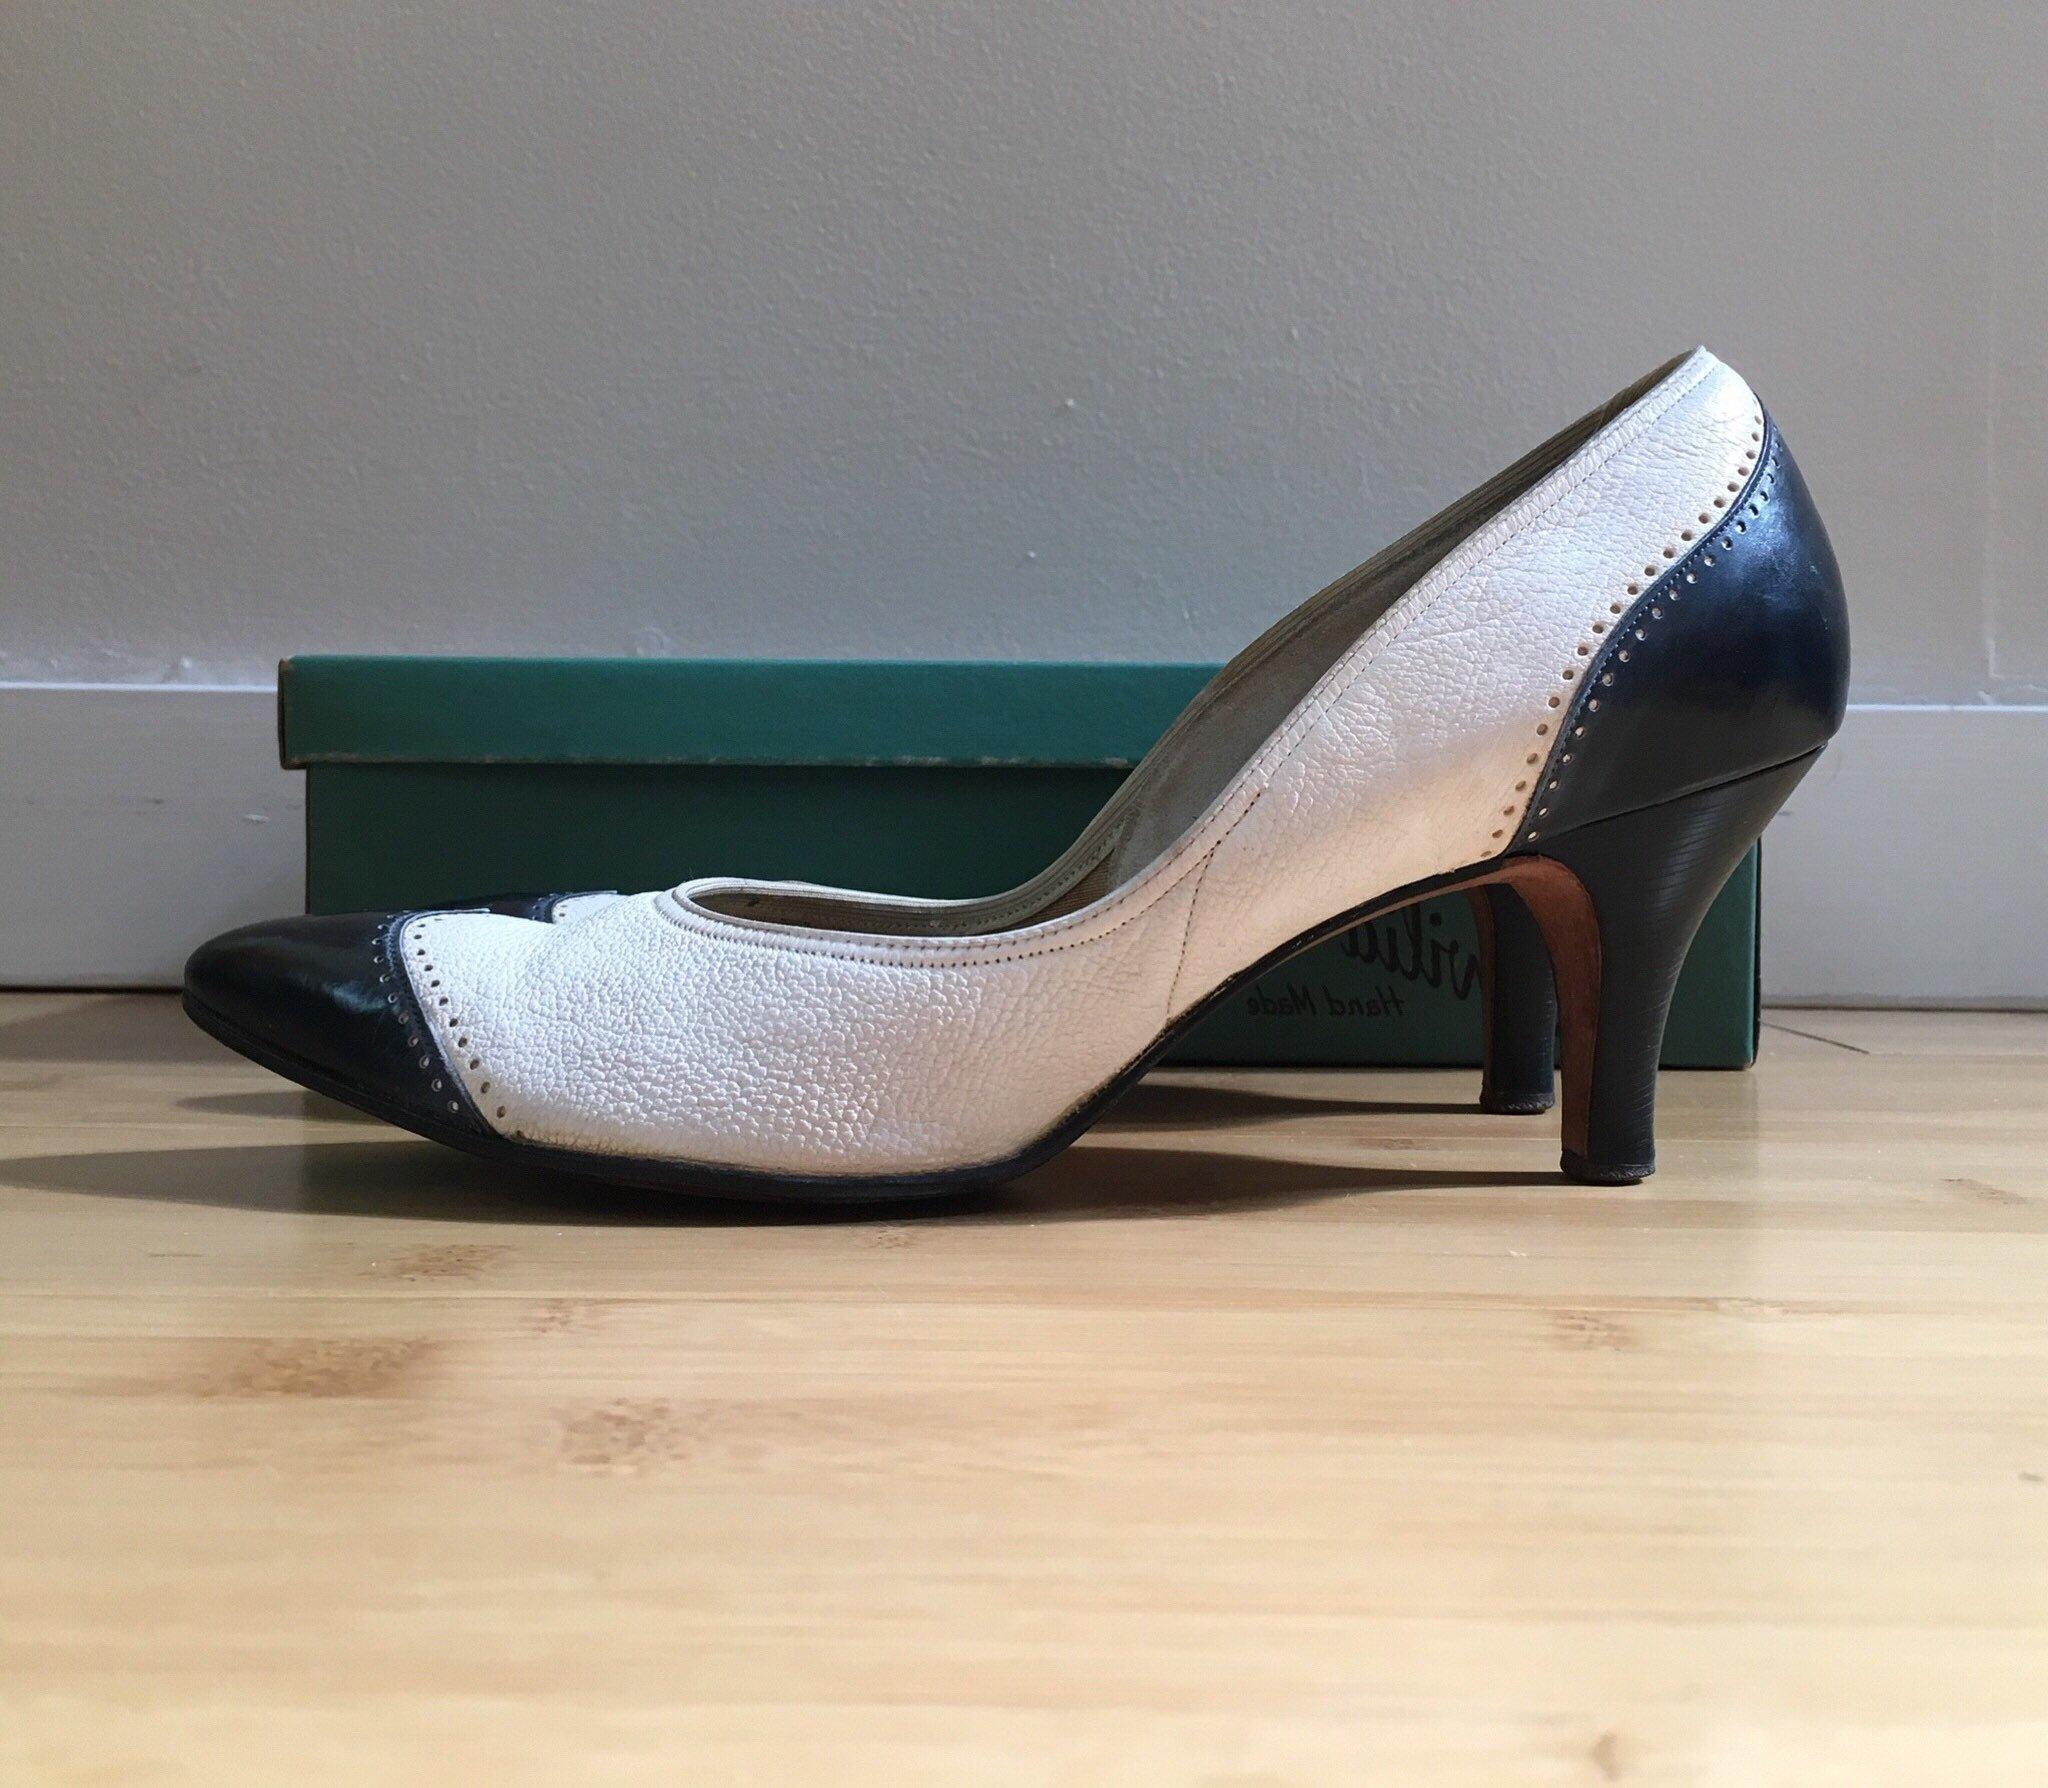 36082747467 Vintage 1950s - women s pin up rockabilly white   navy blue leather  spectator wingtip heels   pumps - size 8.5 - original box